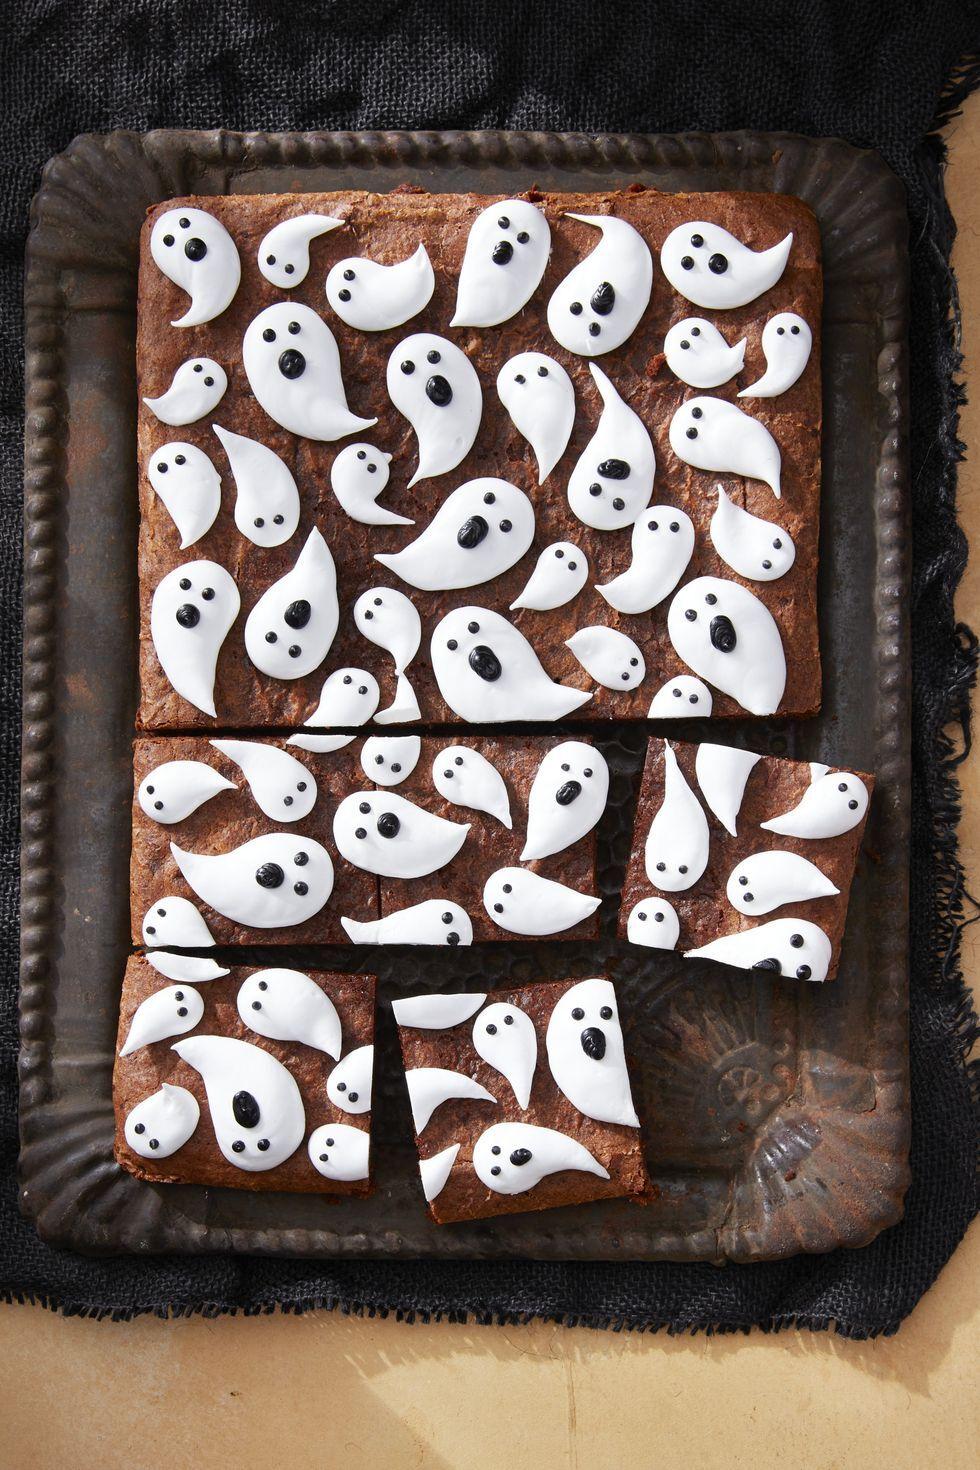 marshmallow-ghost-brownies-halloween-recipe-1567797039